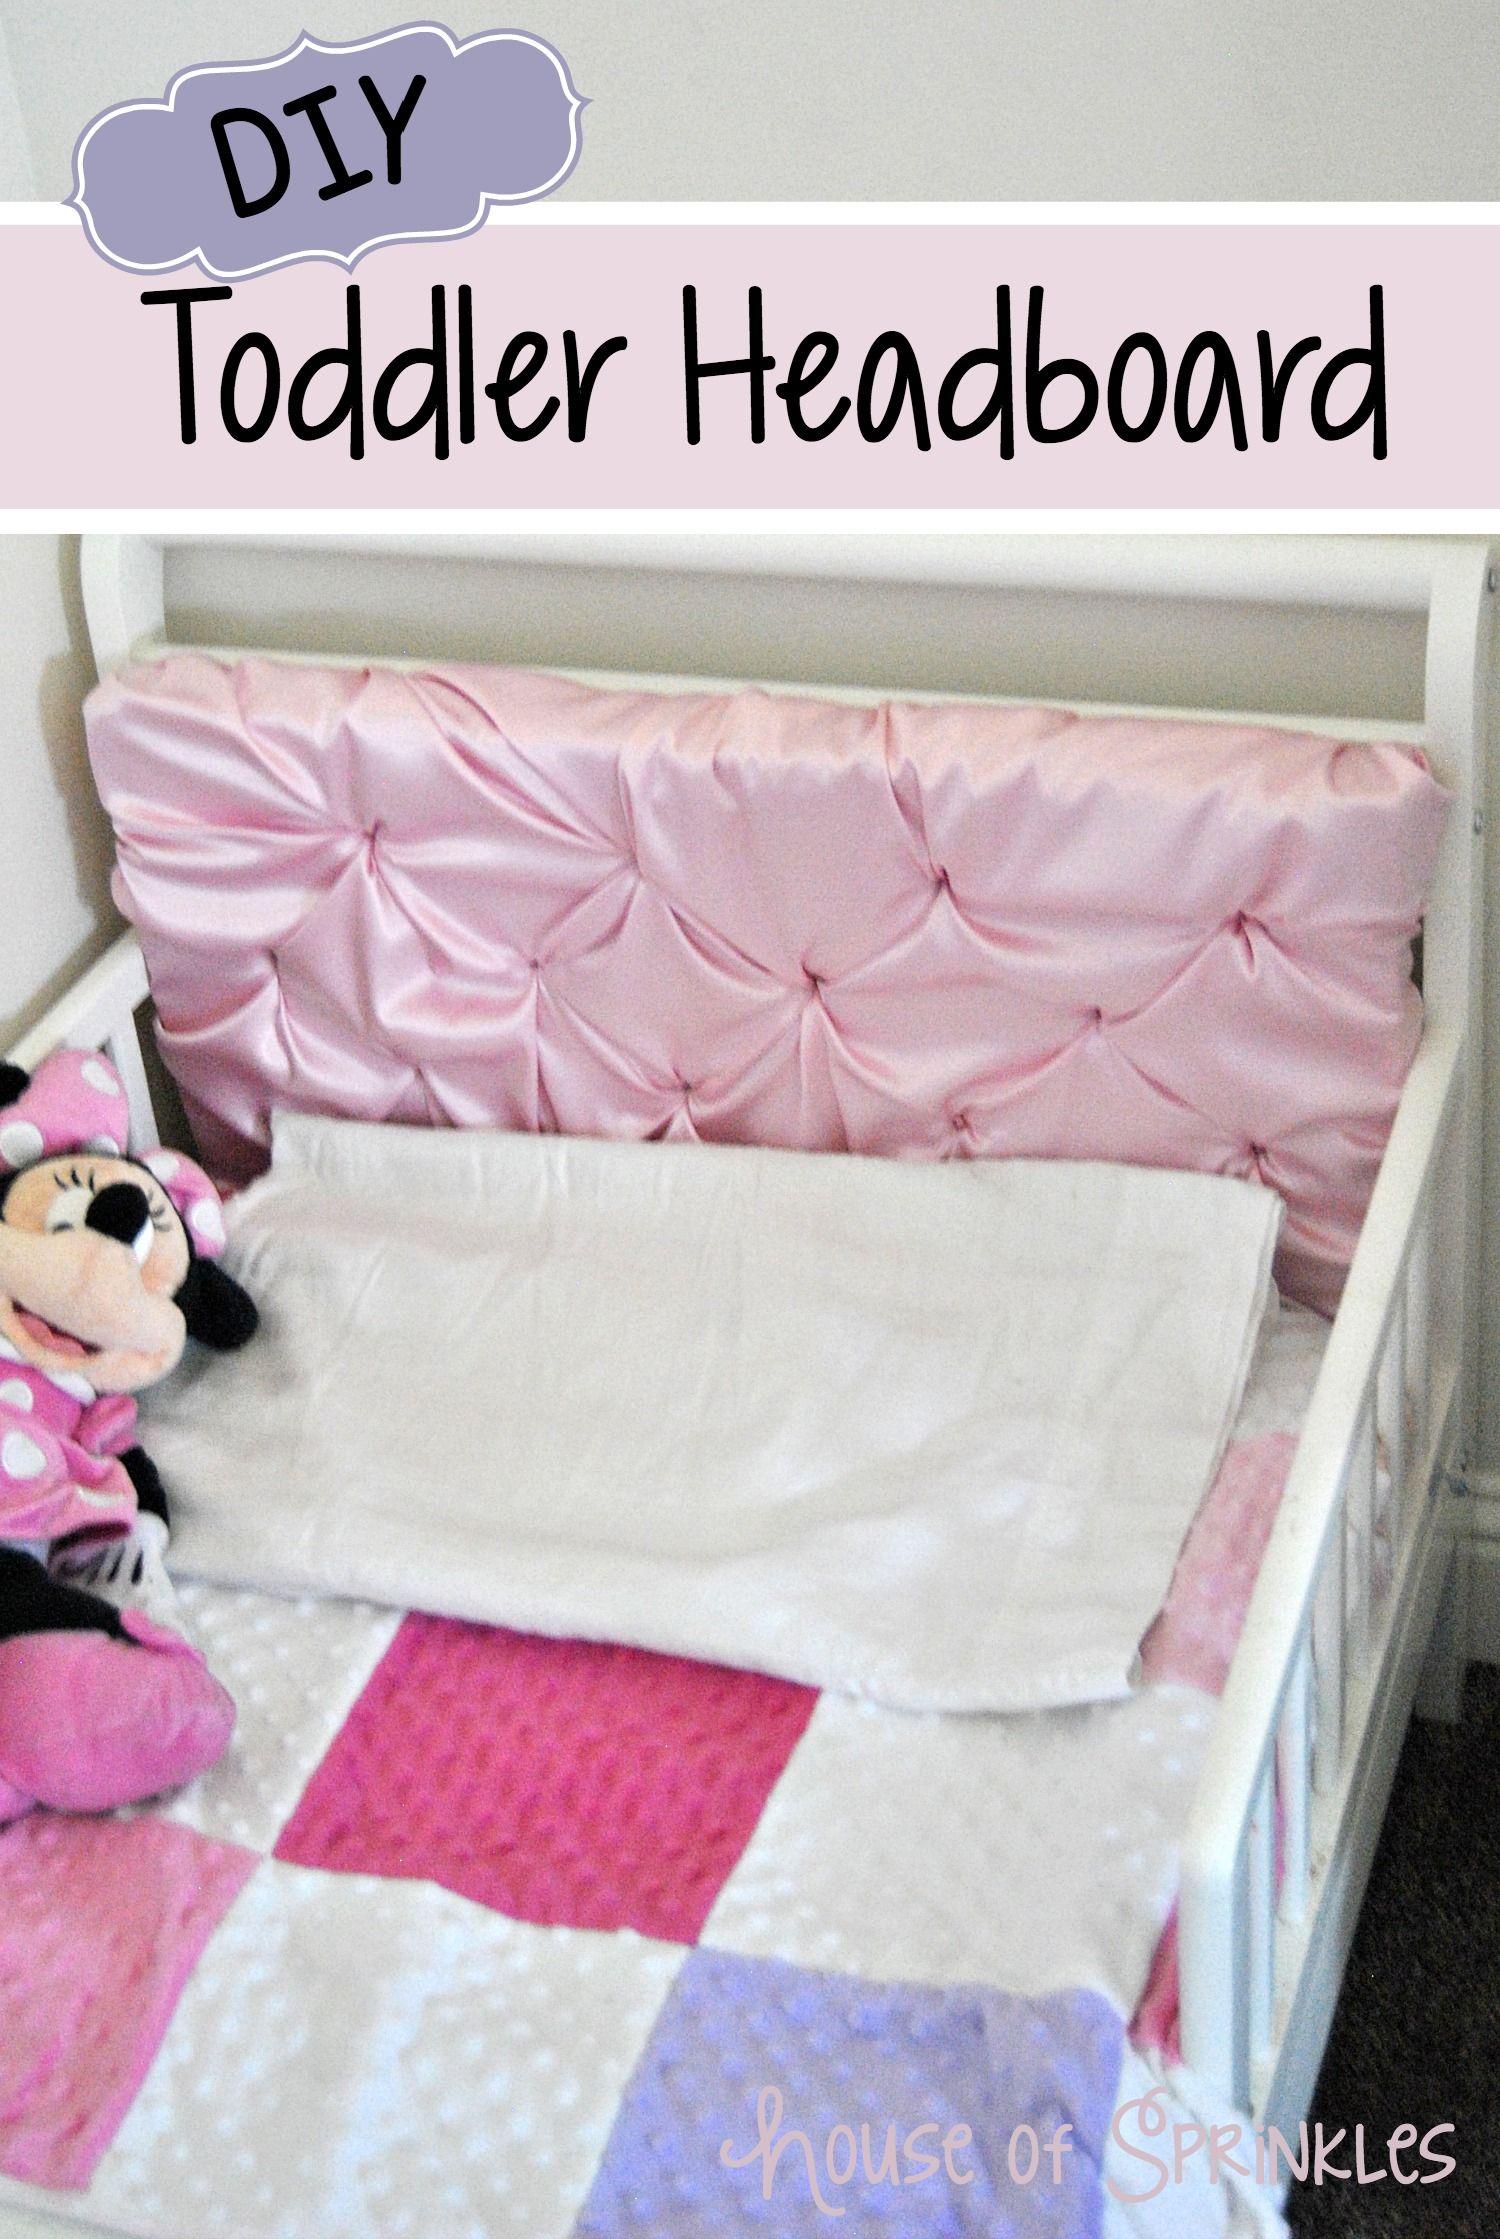 headboards bedroom decoration for girl rooms teenage little bedrooms kids cool inspirations headboard girls two